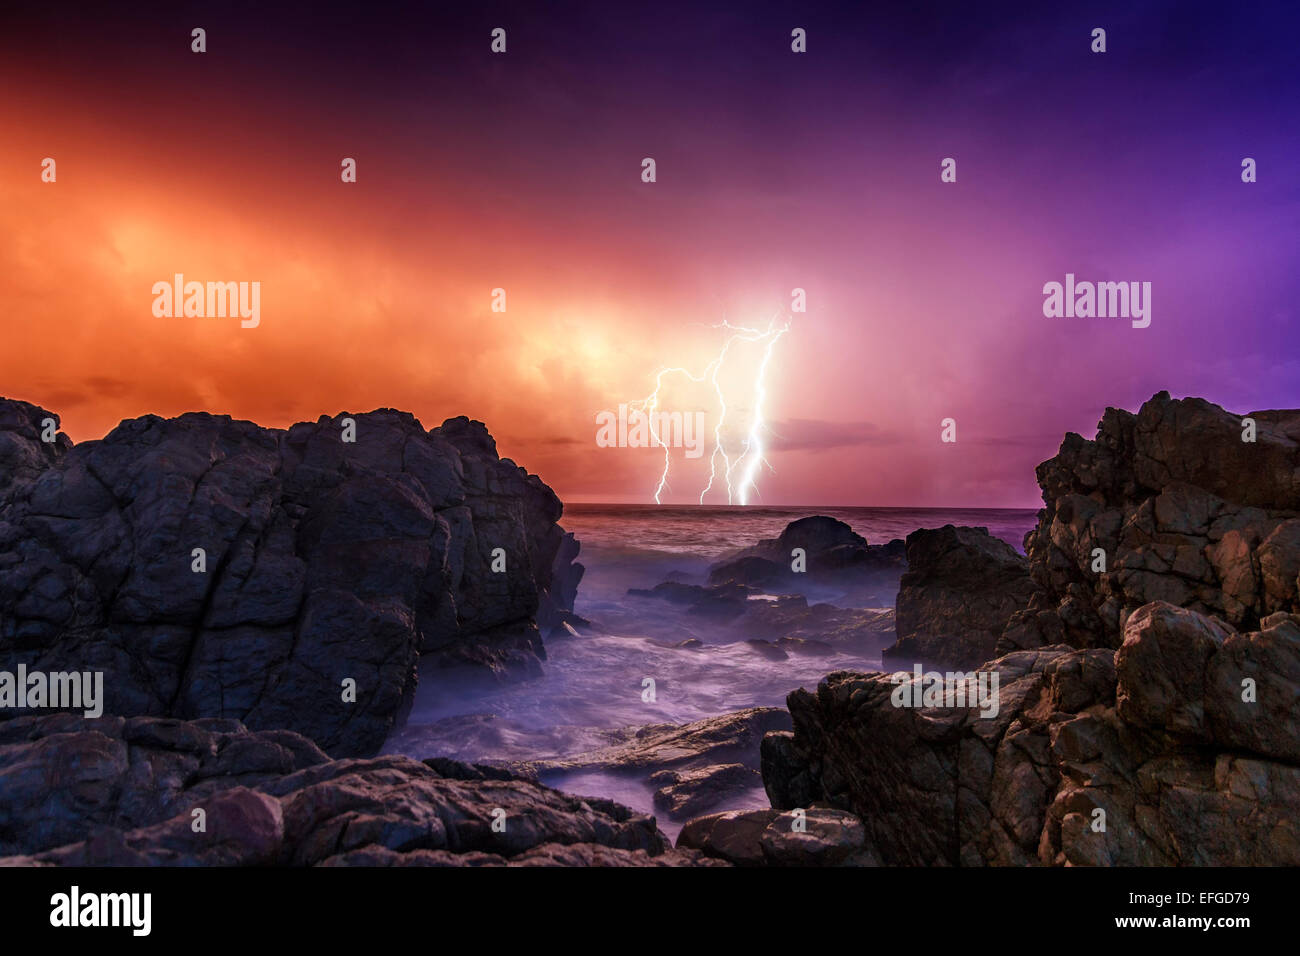 A wonderful New Years Sunrise filled with crashing waves and ferocious lightning. Stock Photo